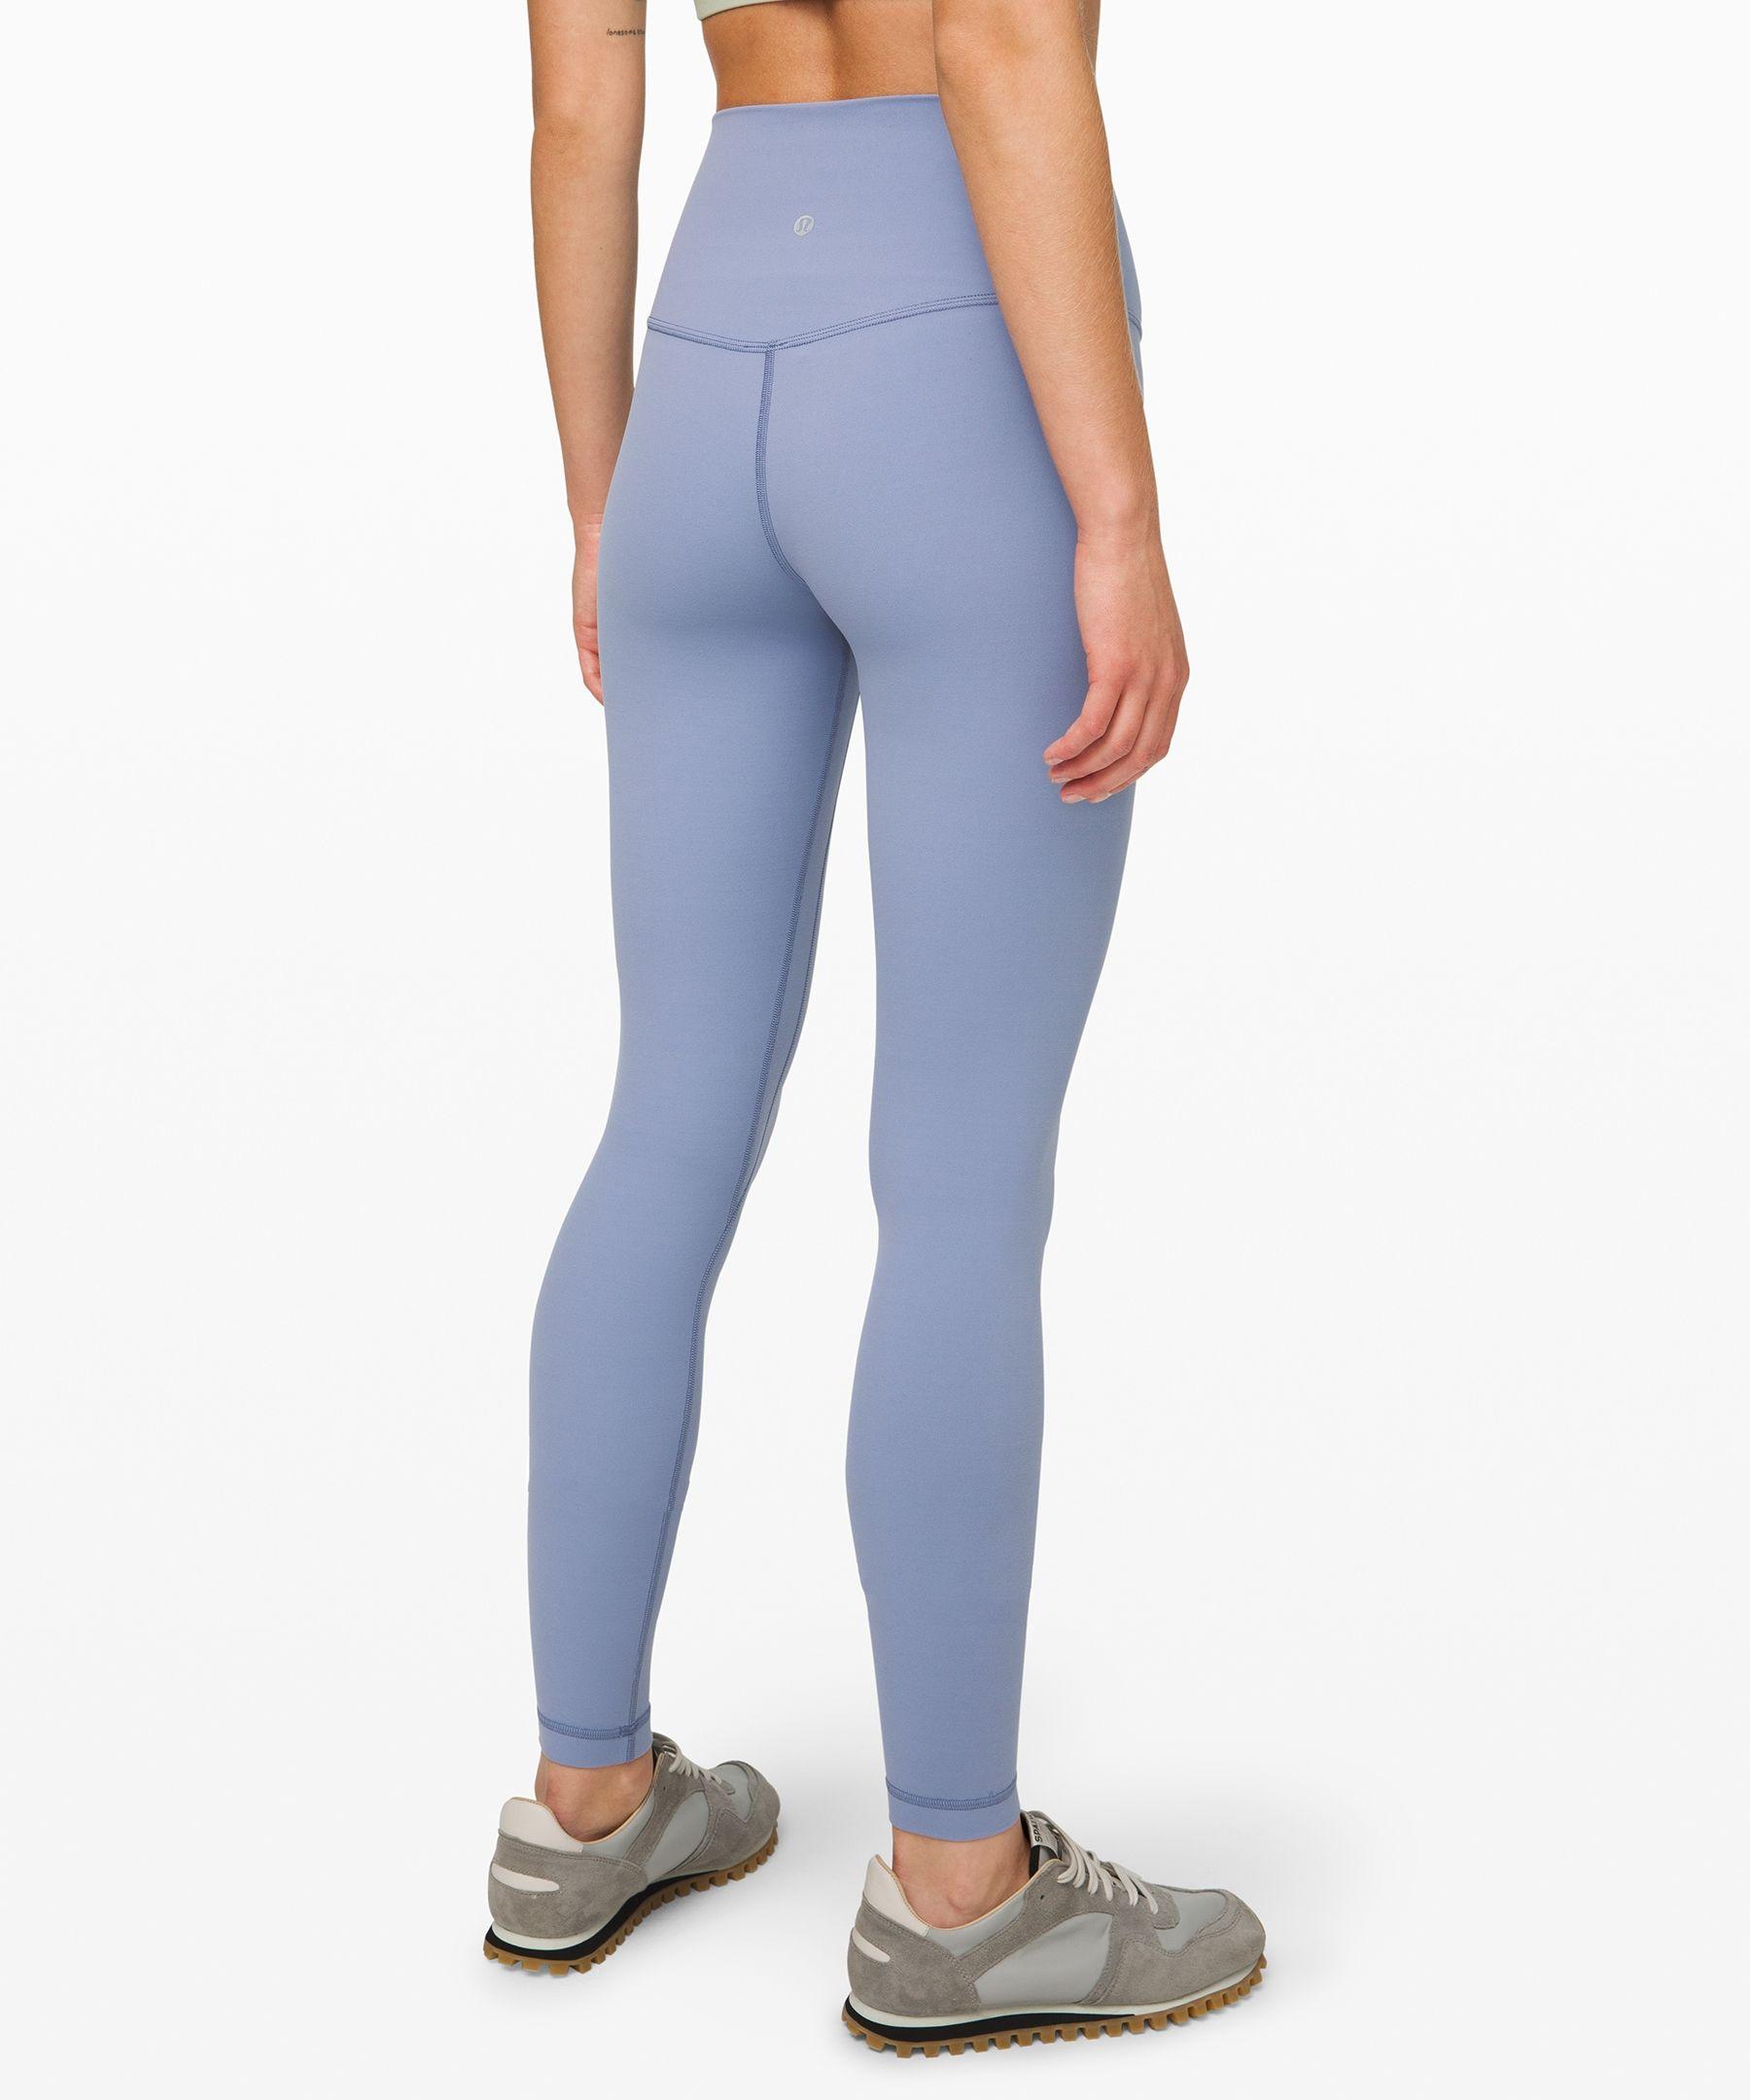 "Align Pant 28"" Women's Pants Pants for women"